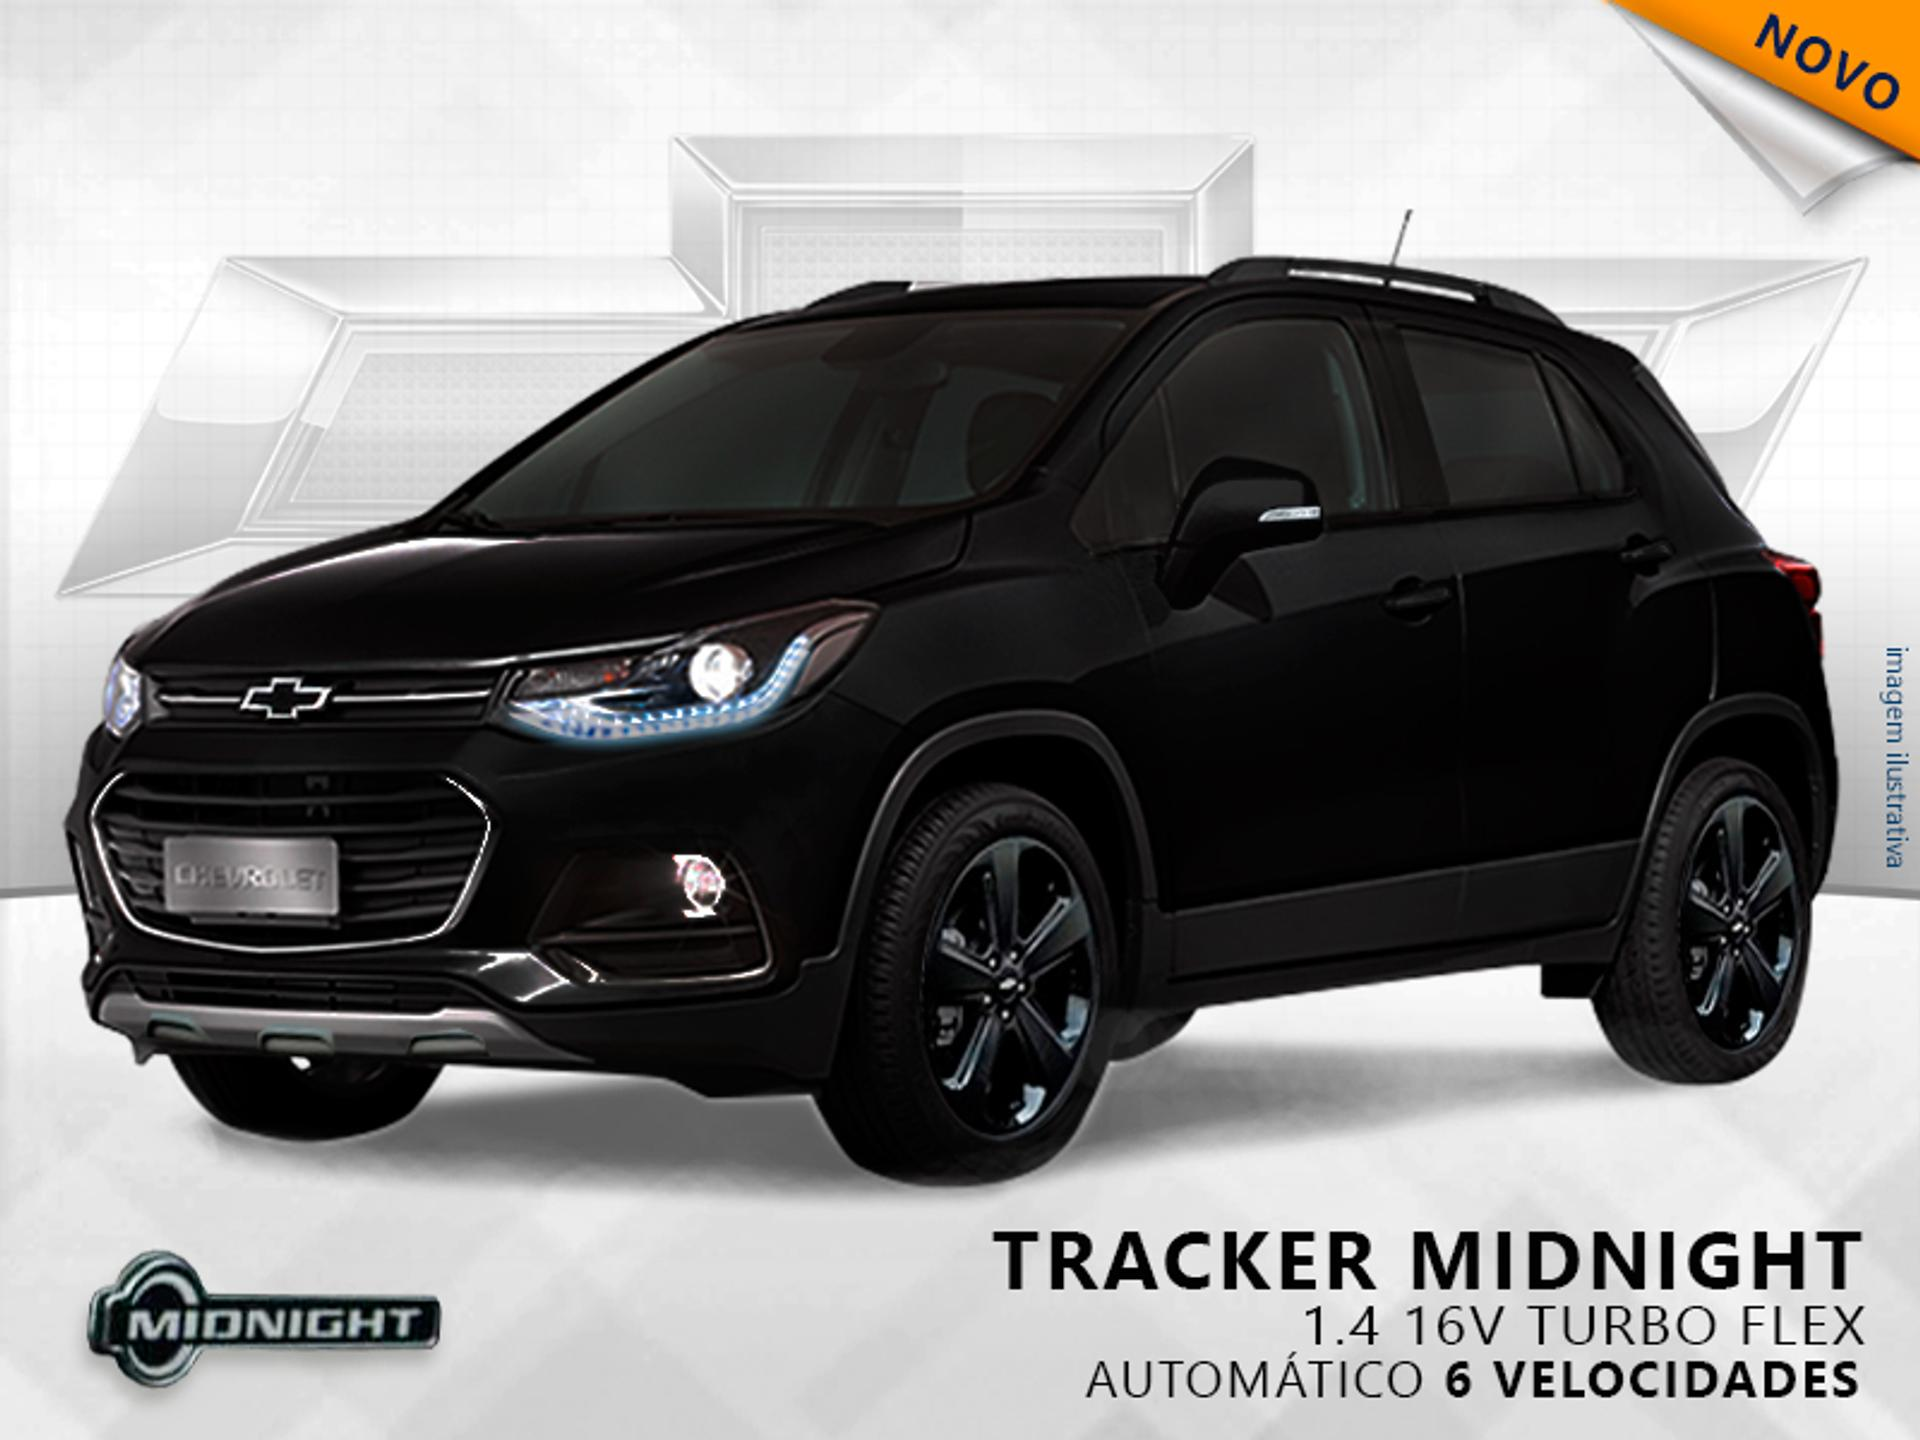 chevrolet-tracker-1.4-16v-turbo-flex-midnight-automatico-wmimagem1335158578